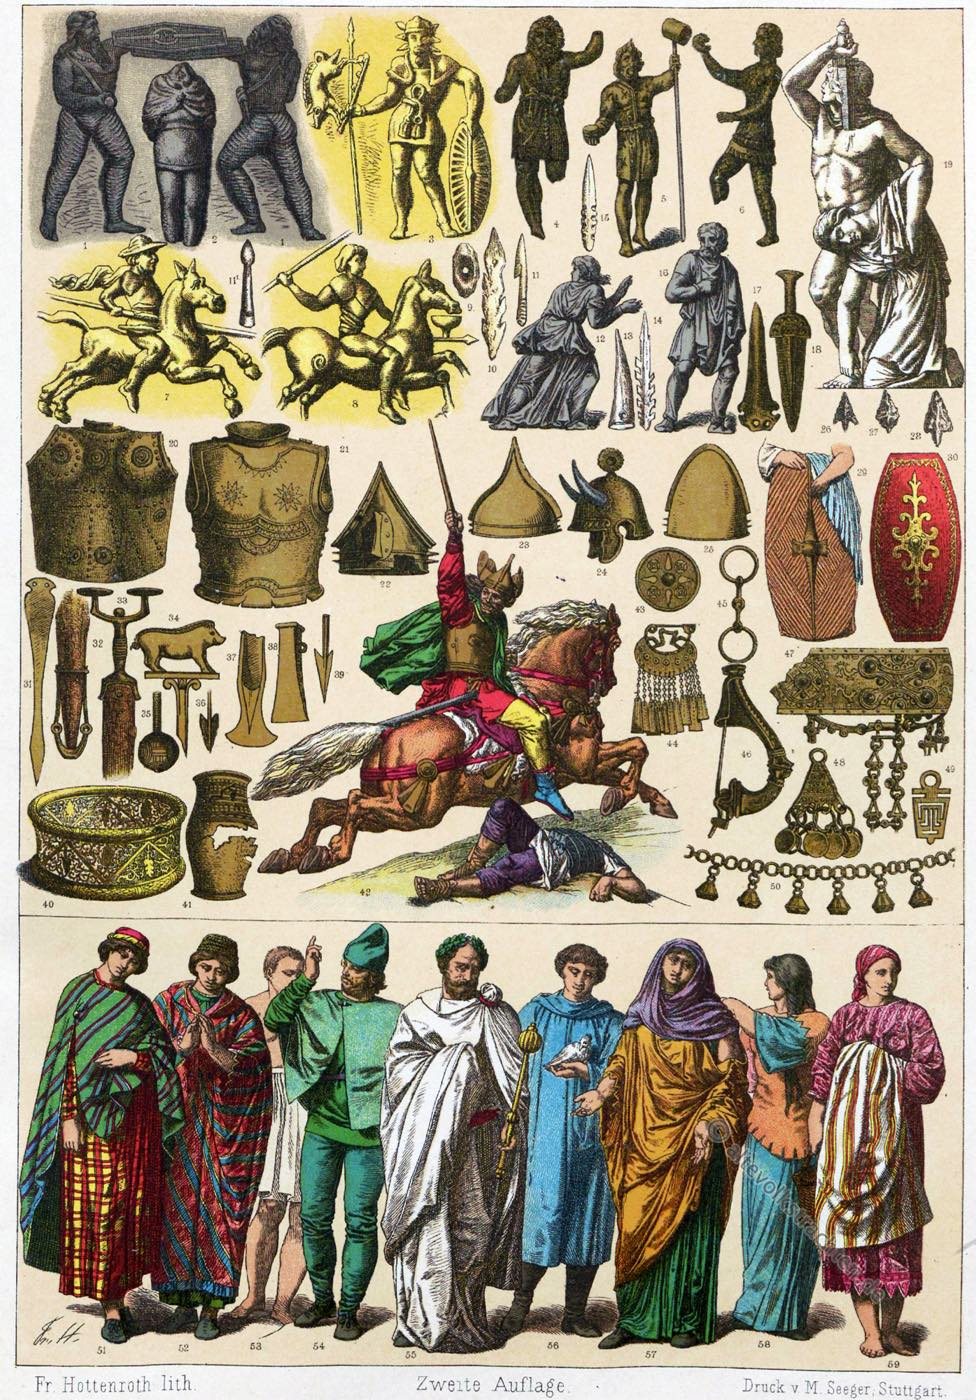 Gallier, Galloromanen, Gewandung, Gallien, Kultur, Kostüme, Waffen, Soldaten